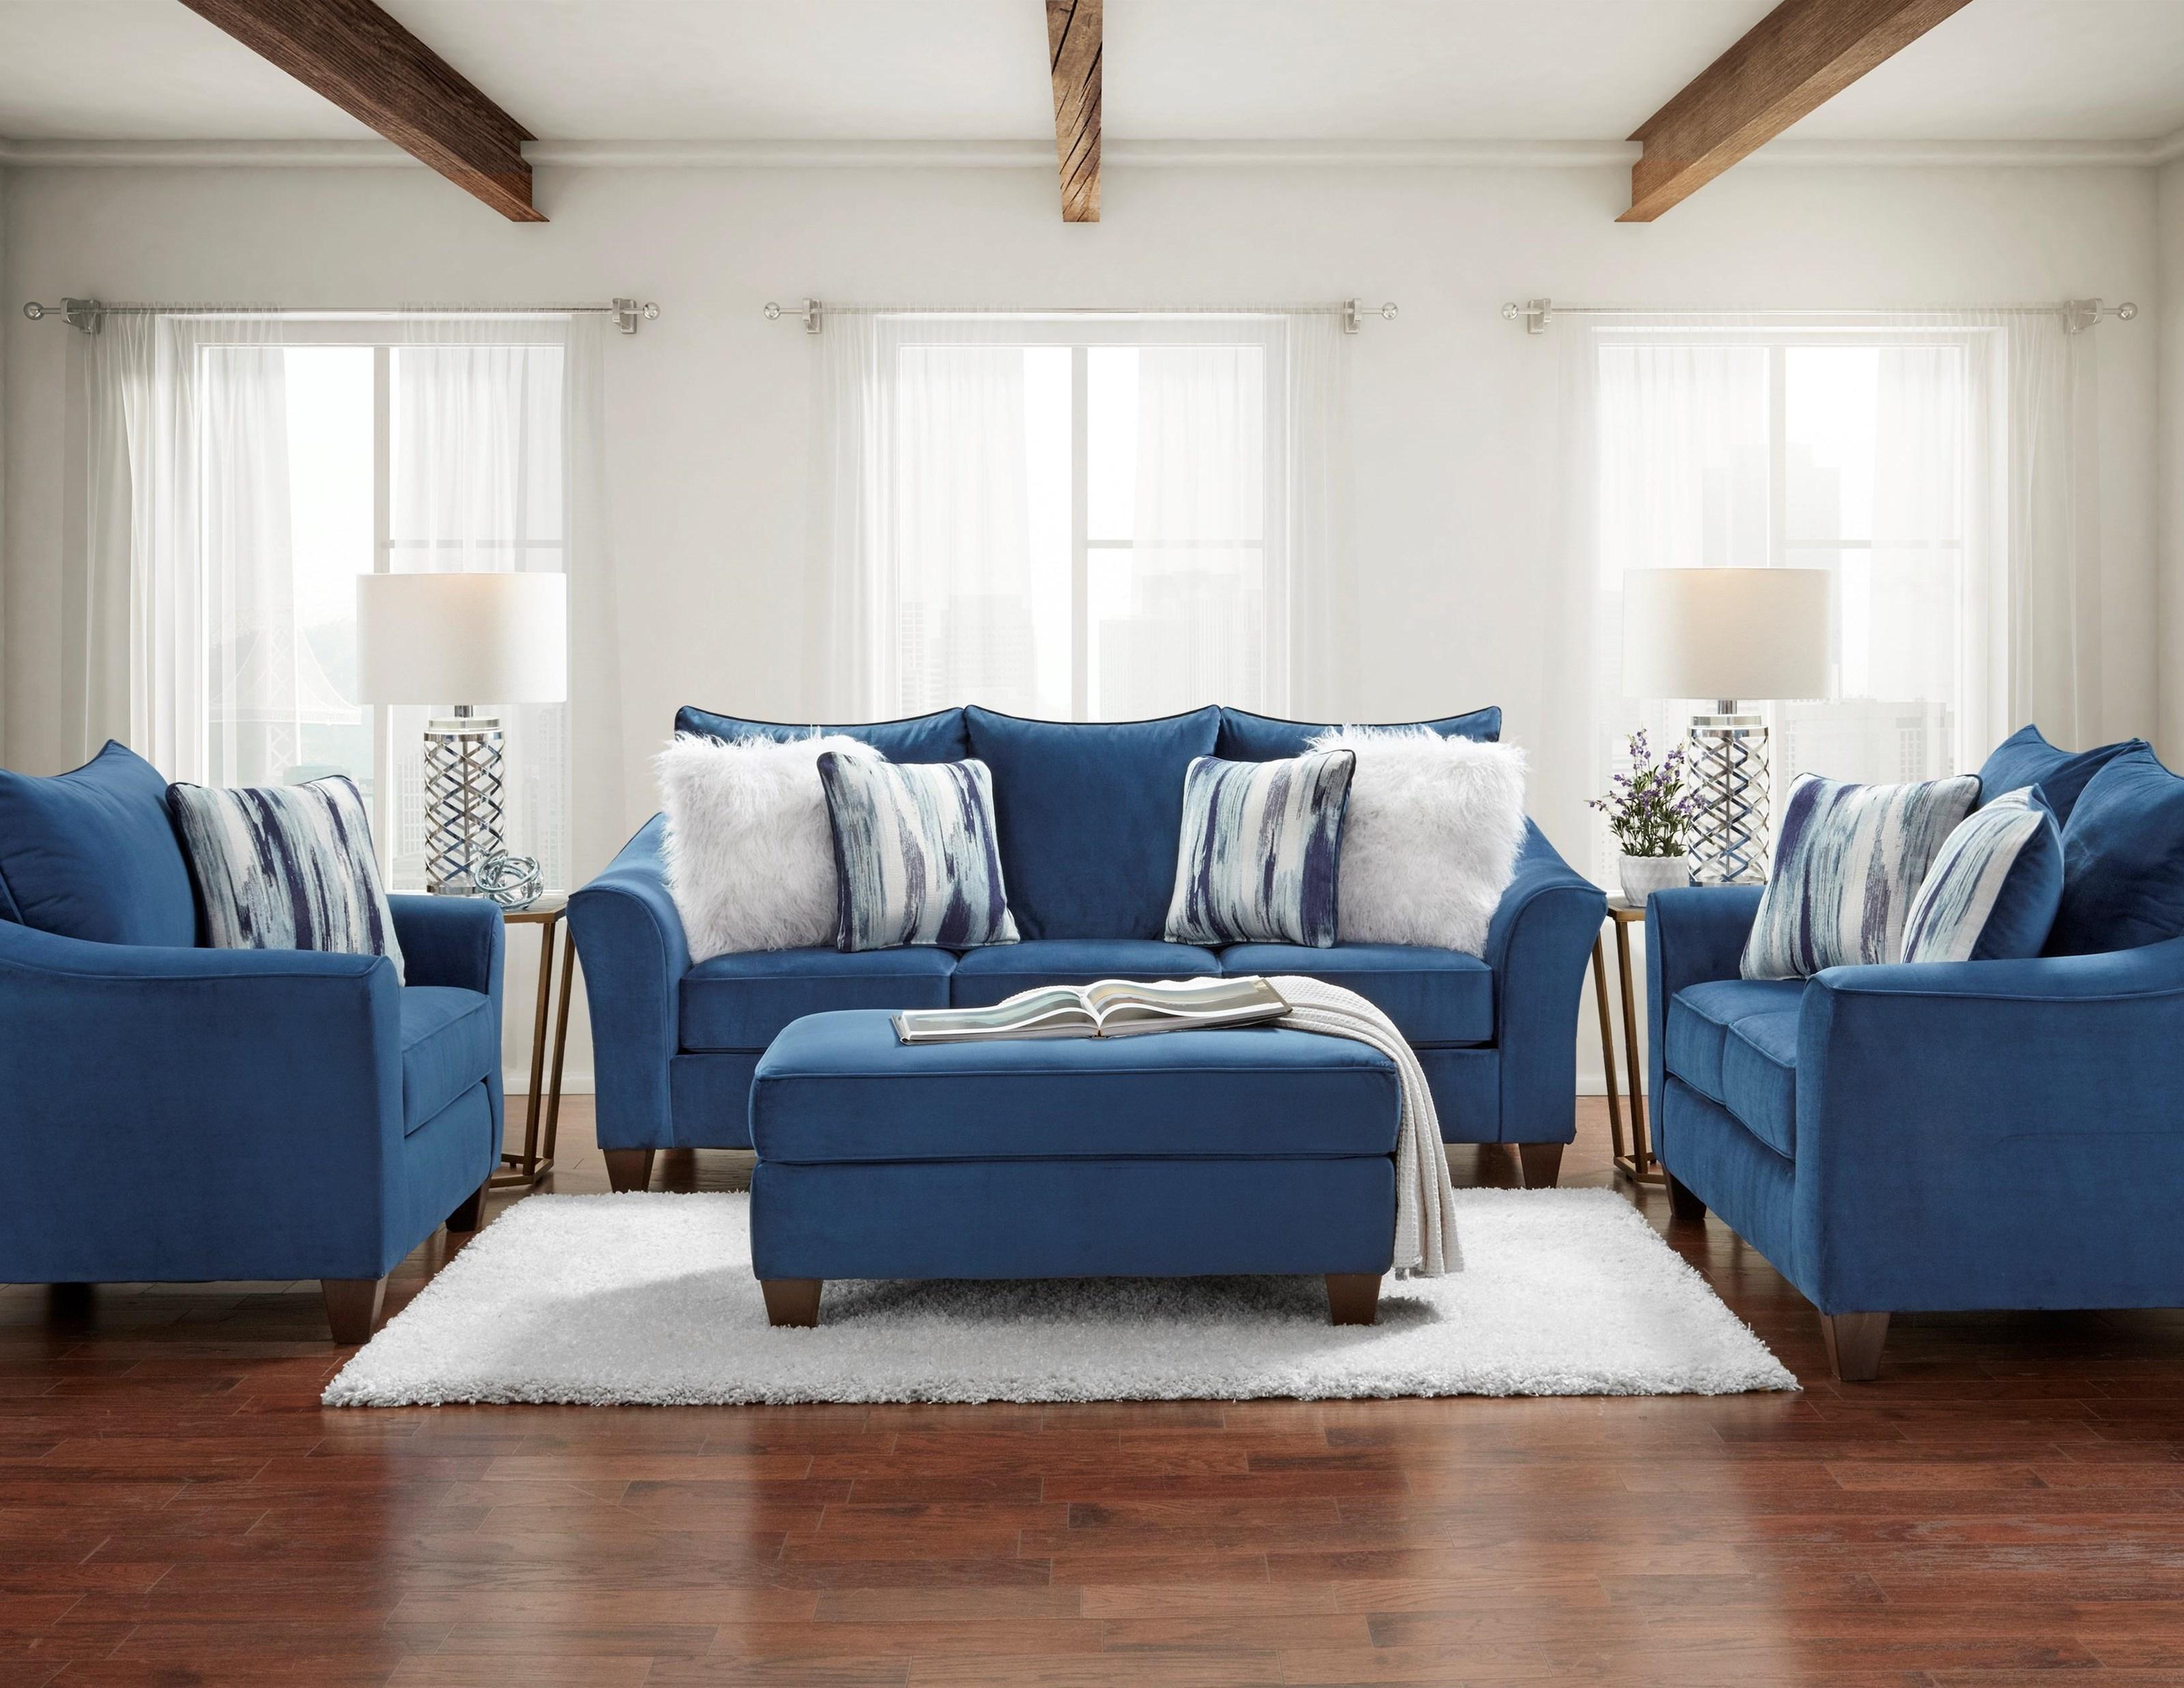 7700 7700 NAVY GROUP by Affordable Furniture at Furniture Fair - North Carolina